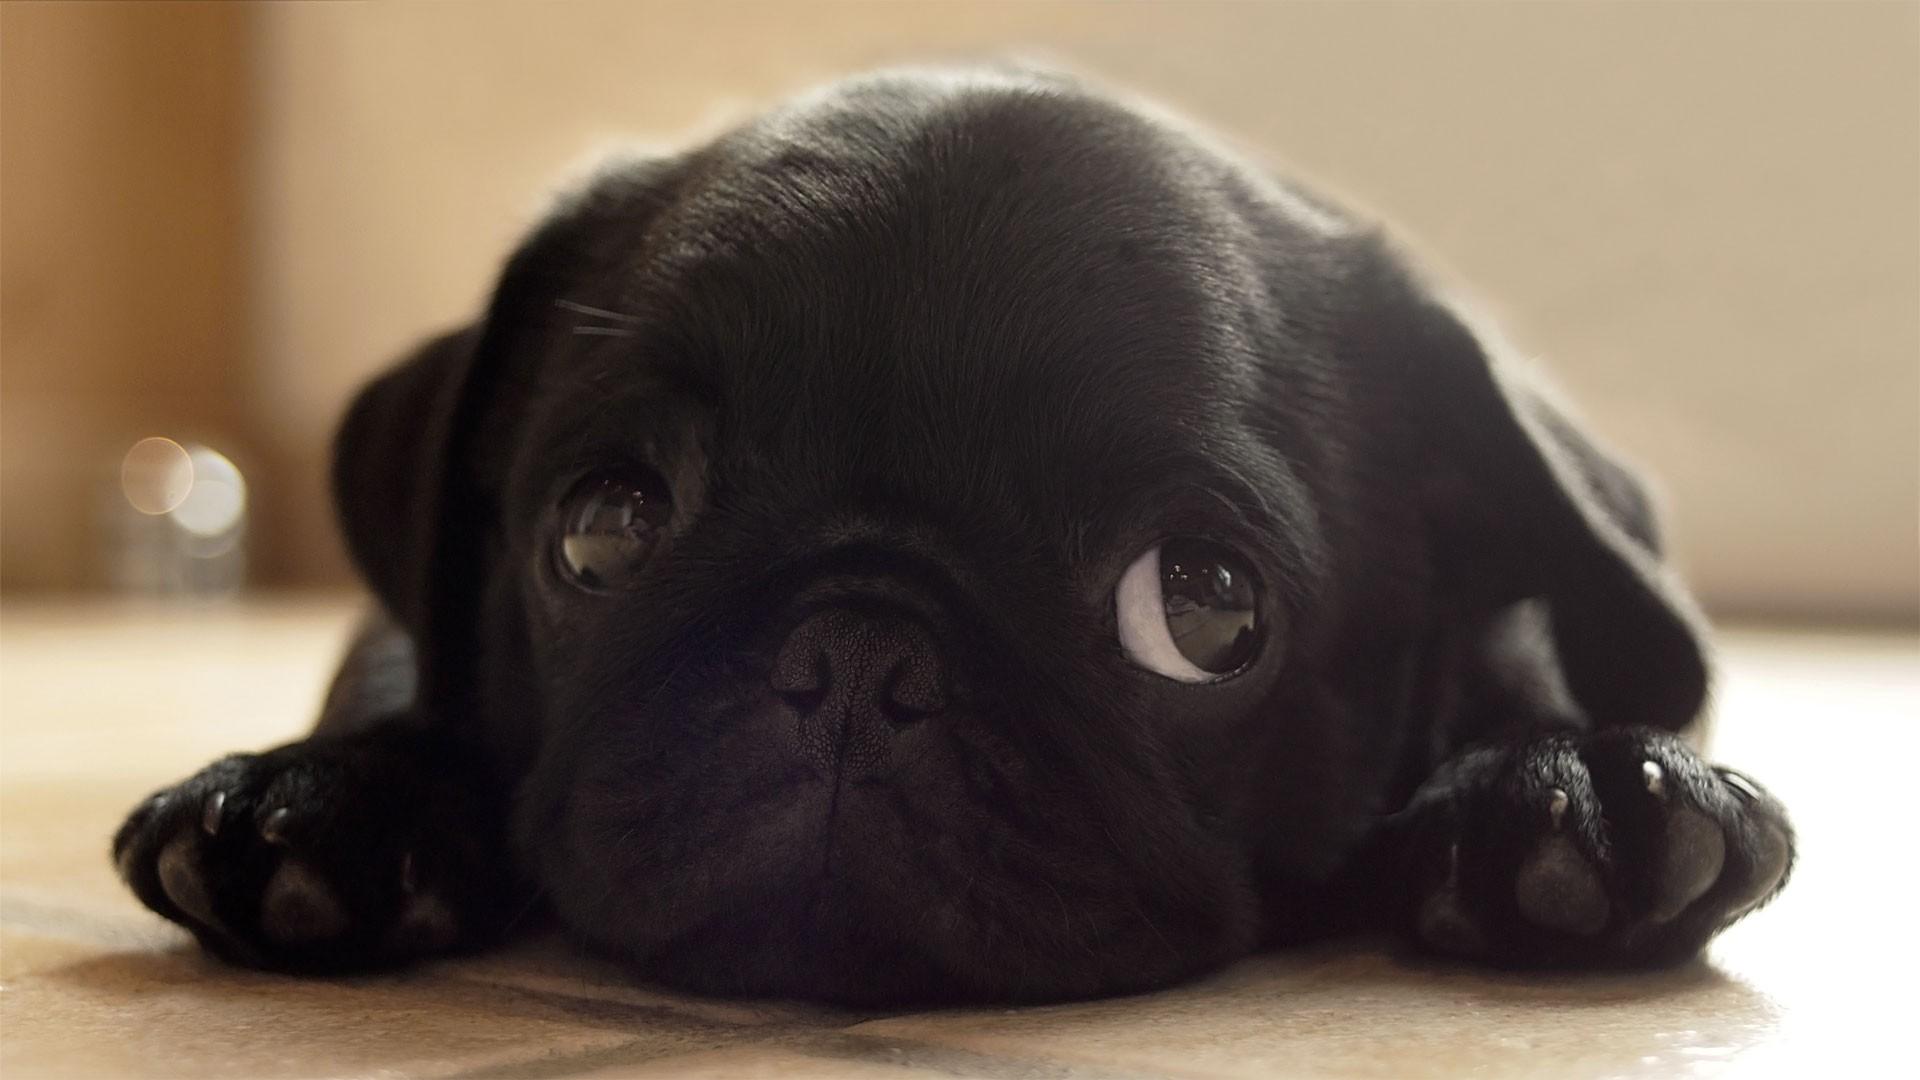 Cute Black Pug Wallpaper HD HD Desktop Wallpaper 1920x1080